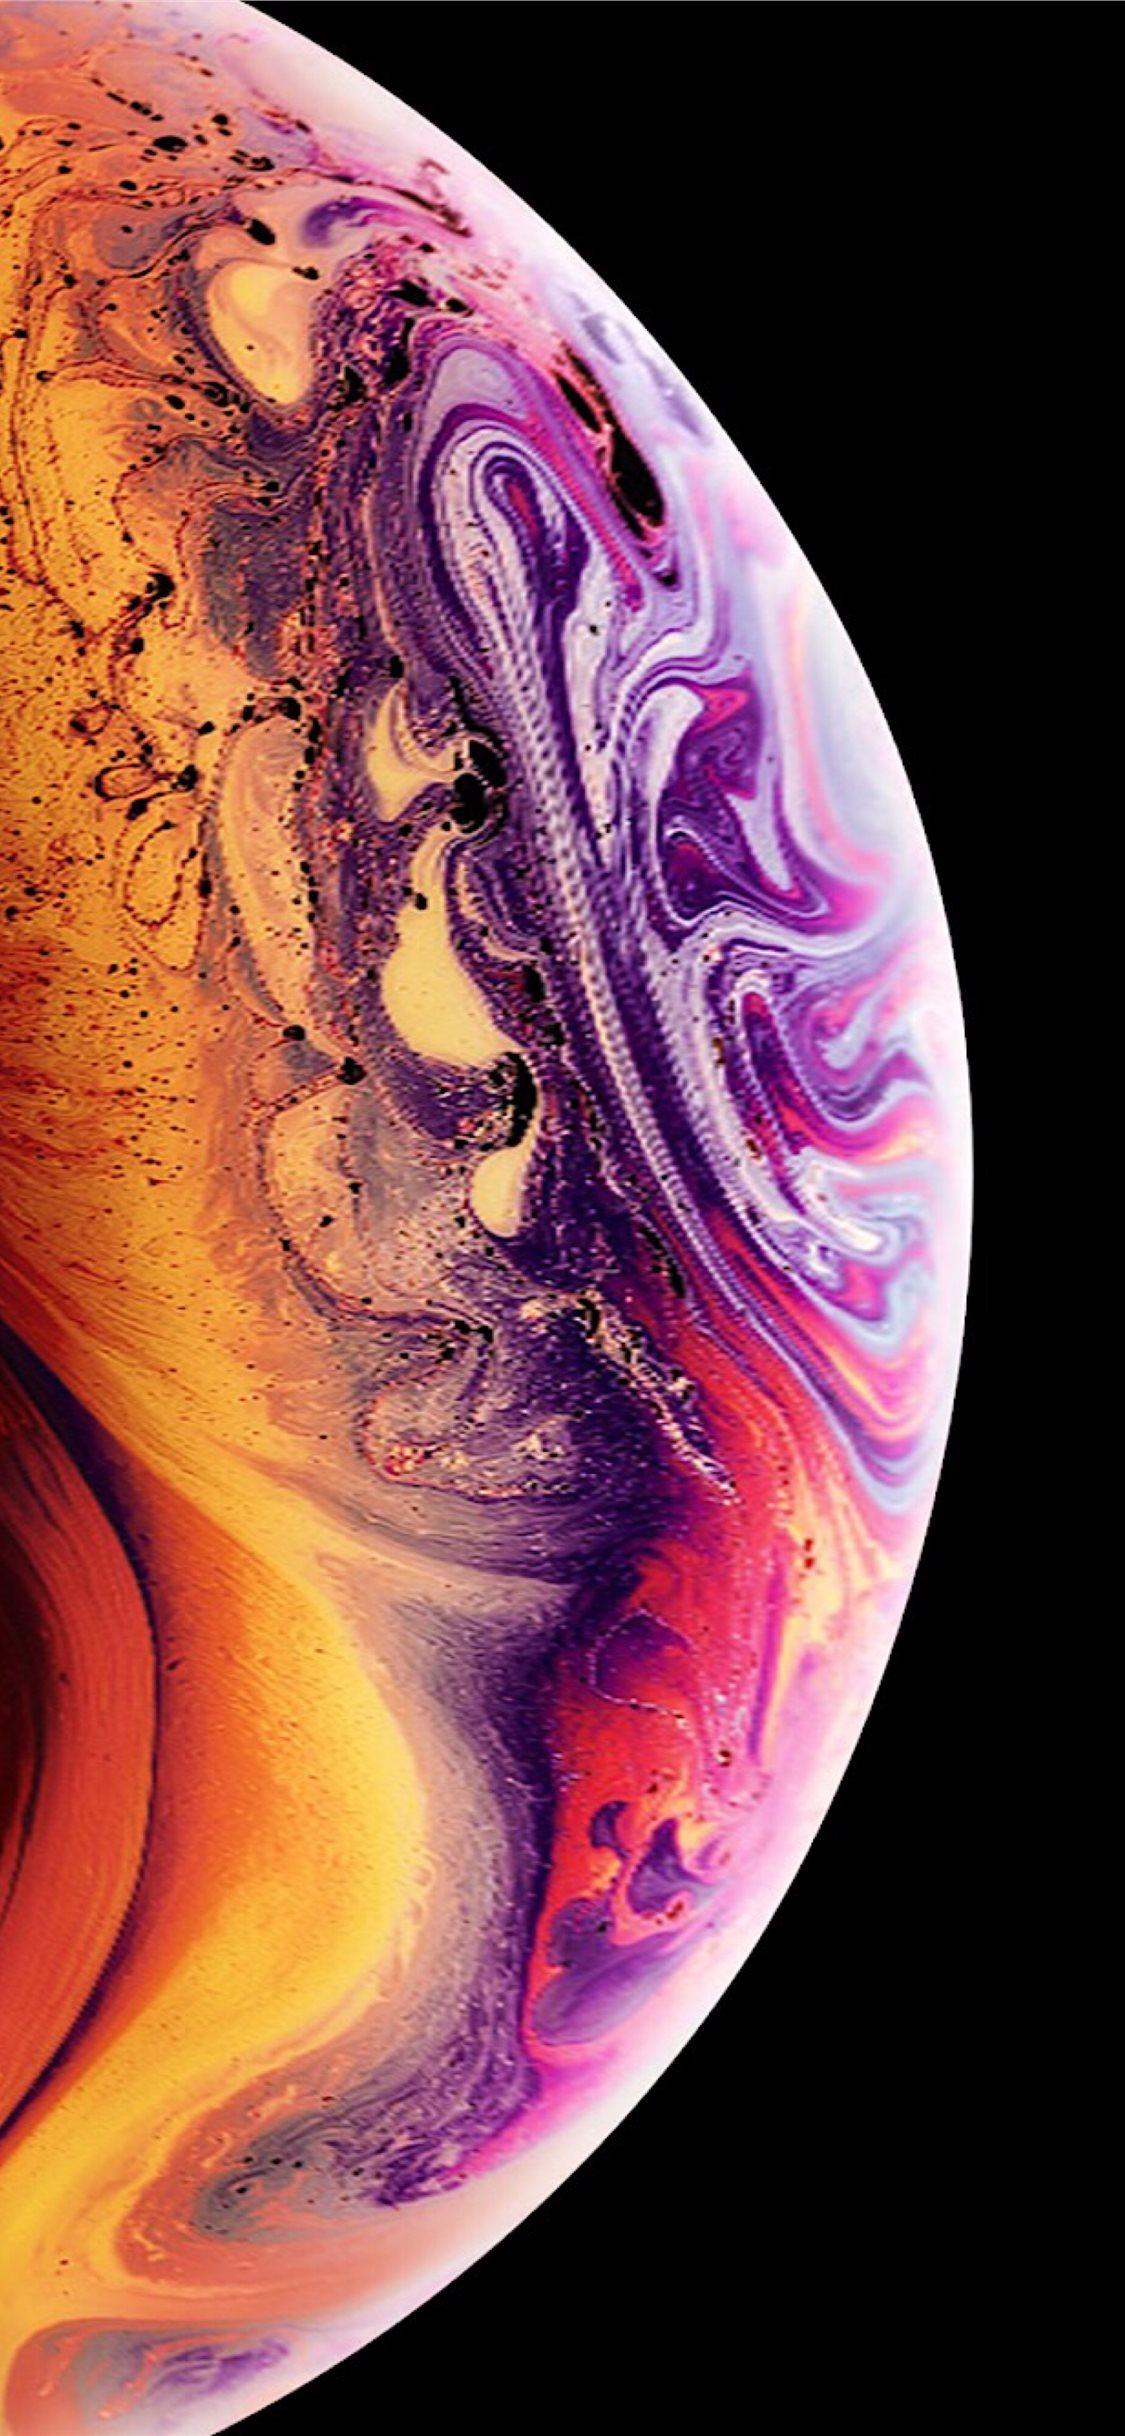 خلفيات iPhone 11 pro